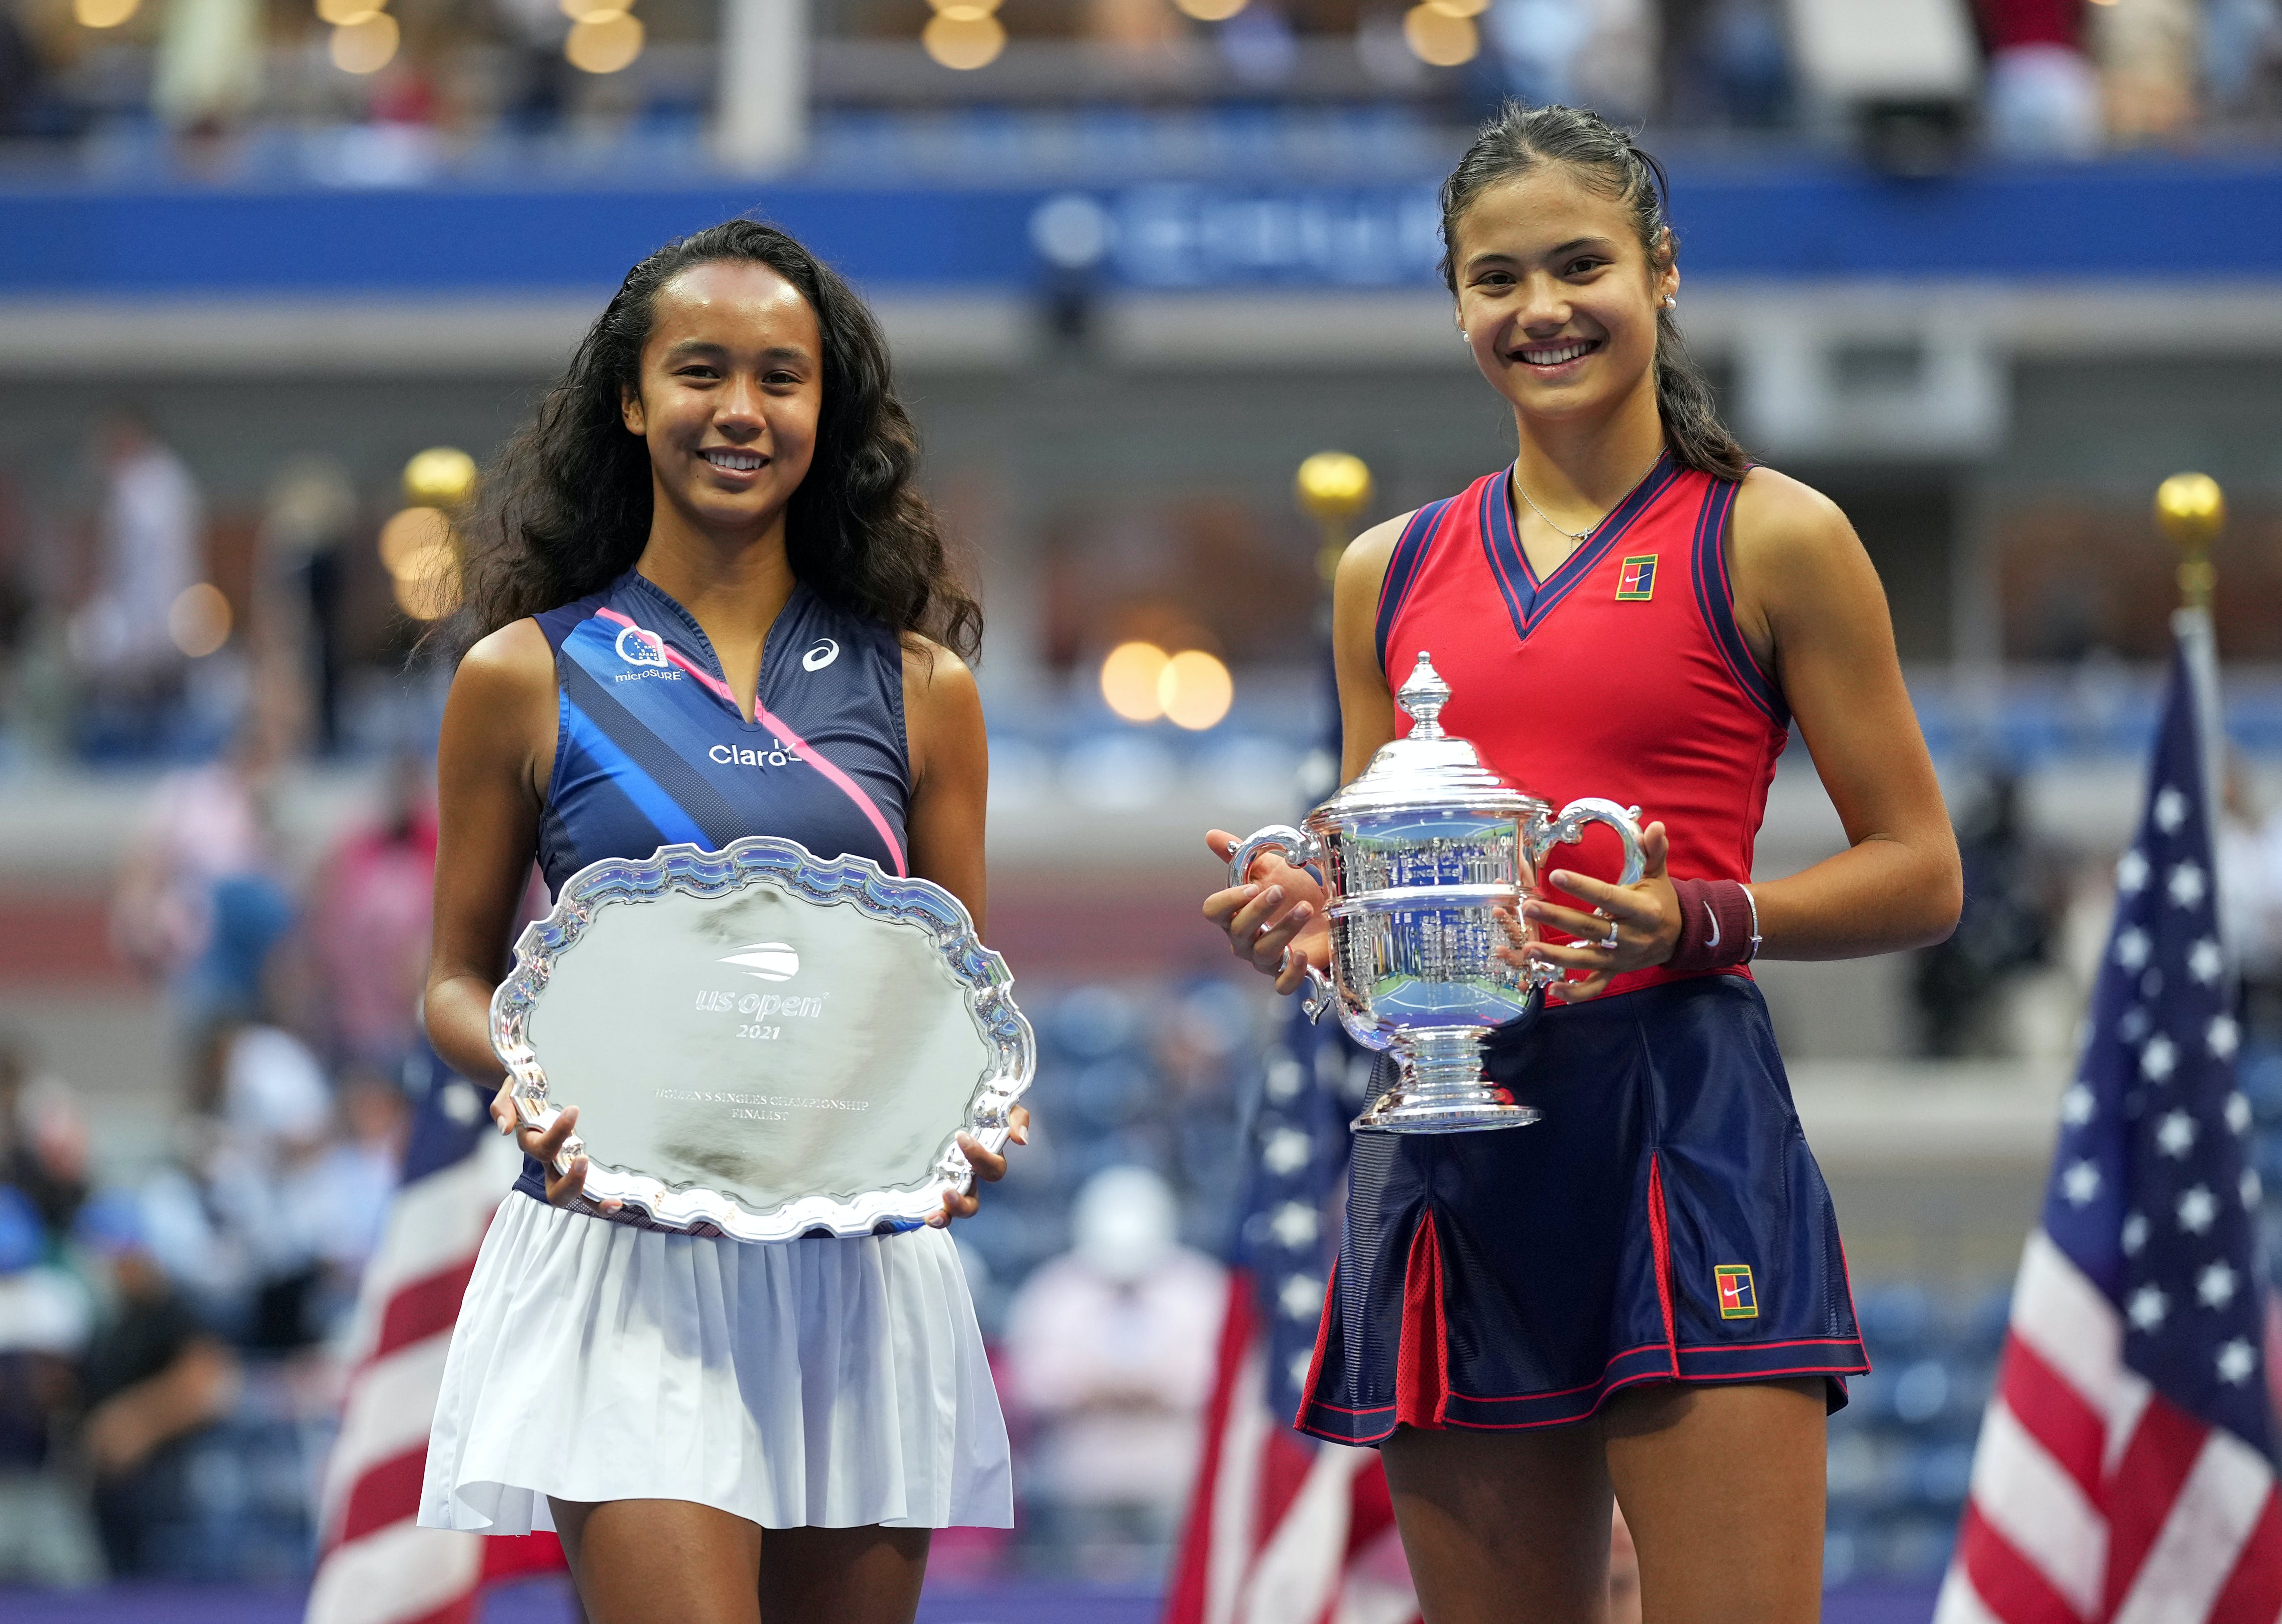 Leylah Fernandez & Emma Raducanu / US Open 2021